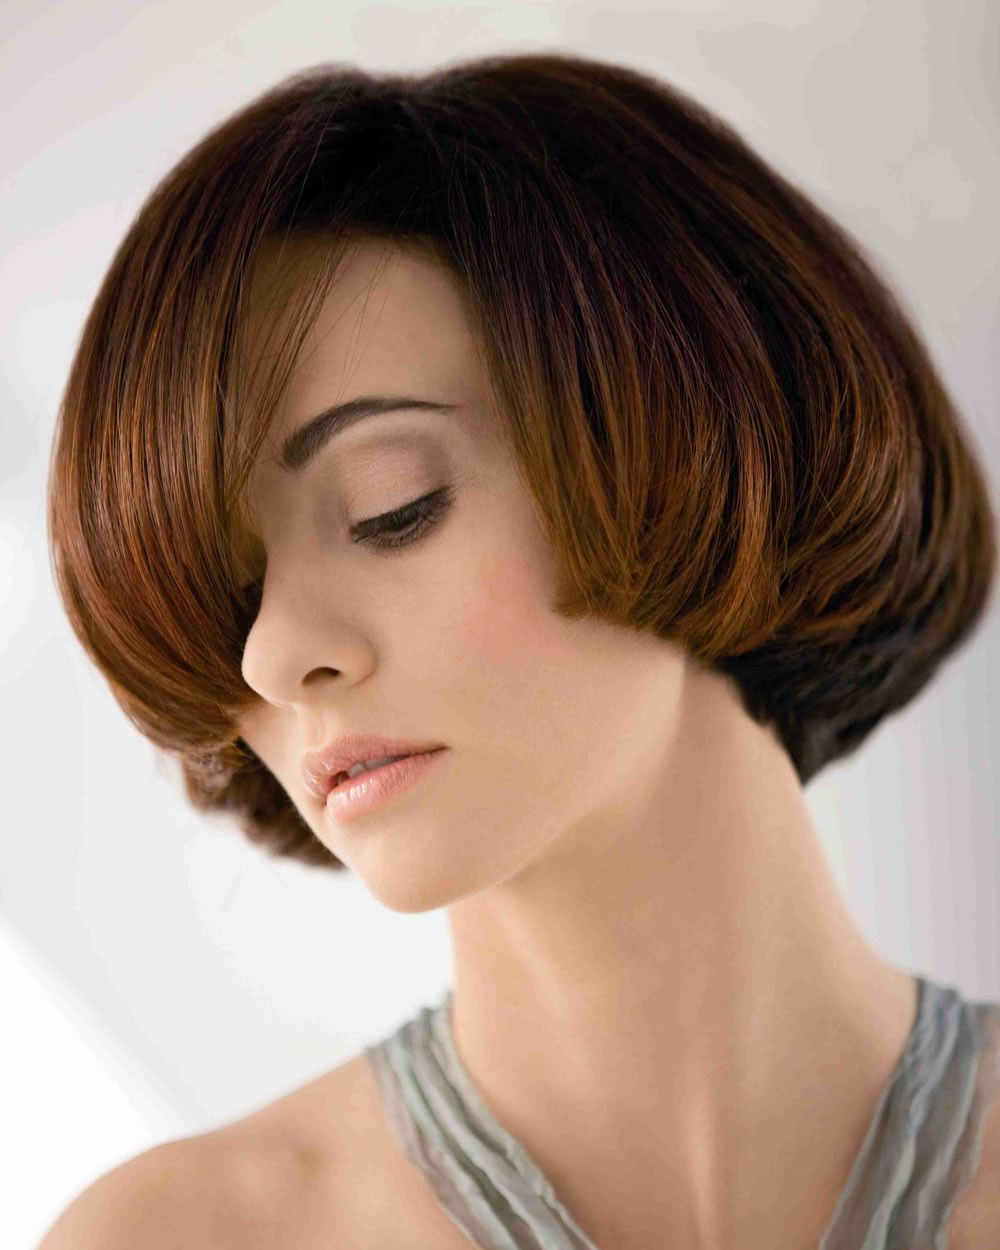 Round Face Short Haircuts قصات شعر قصير للوجه المستدير Bobs Haircuts Short Hair Lengths Bob Haircuts For Women